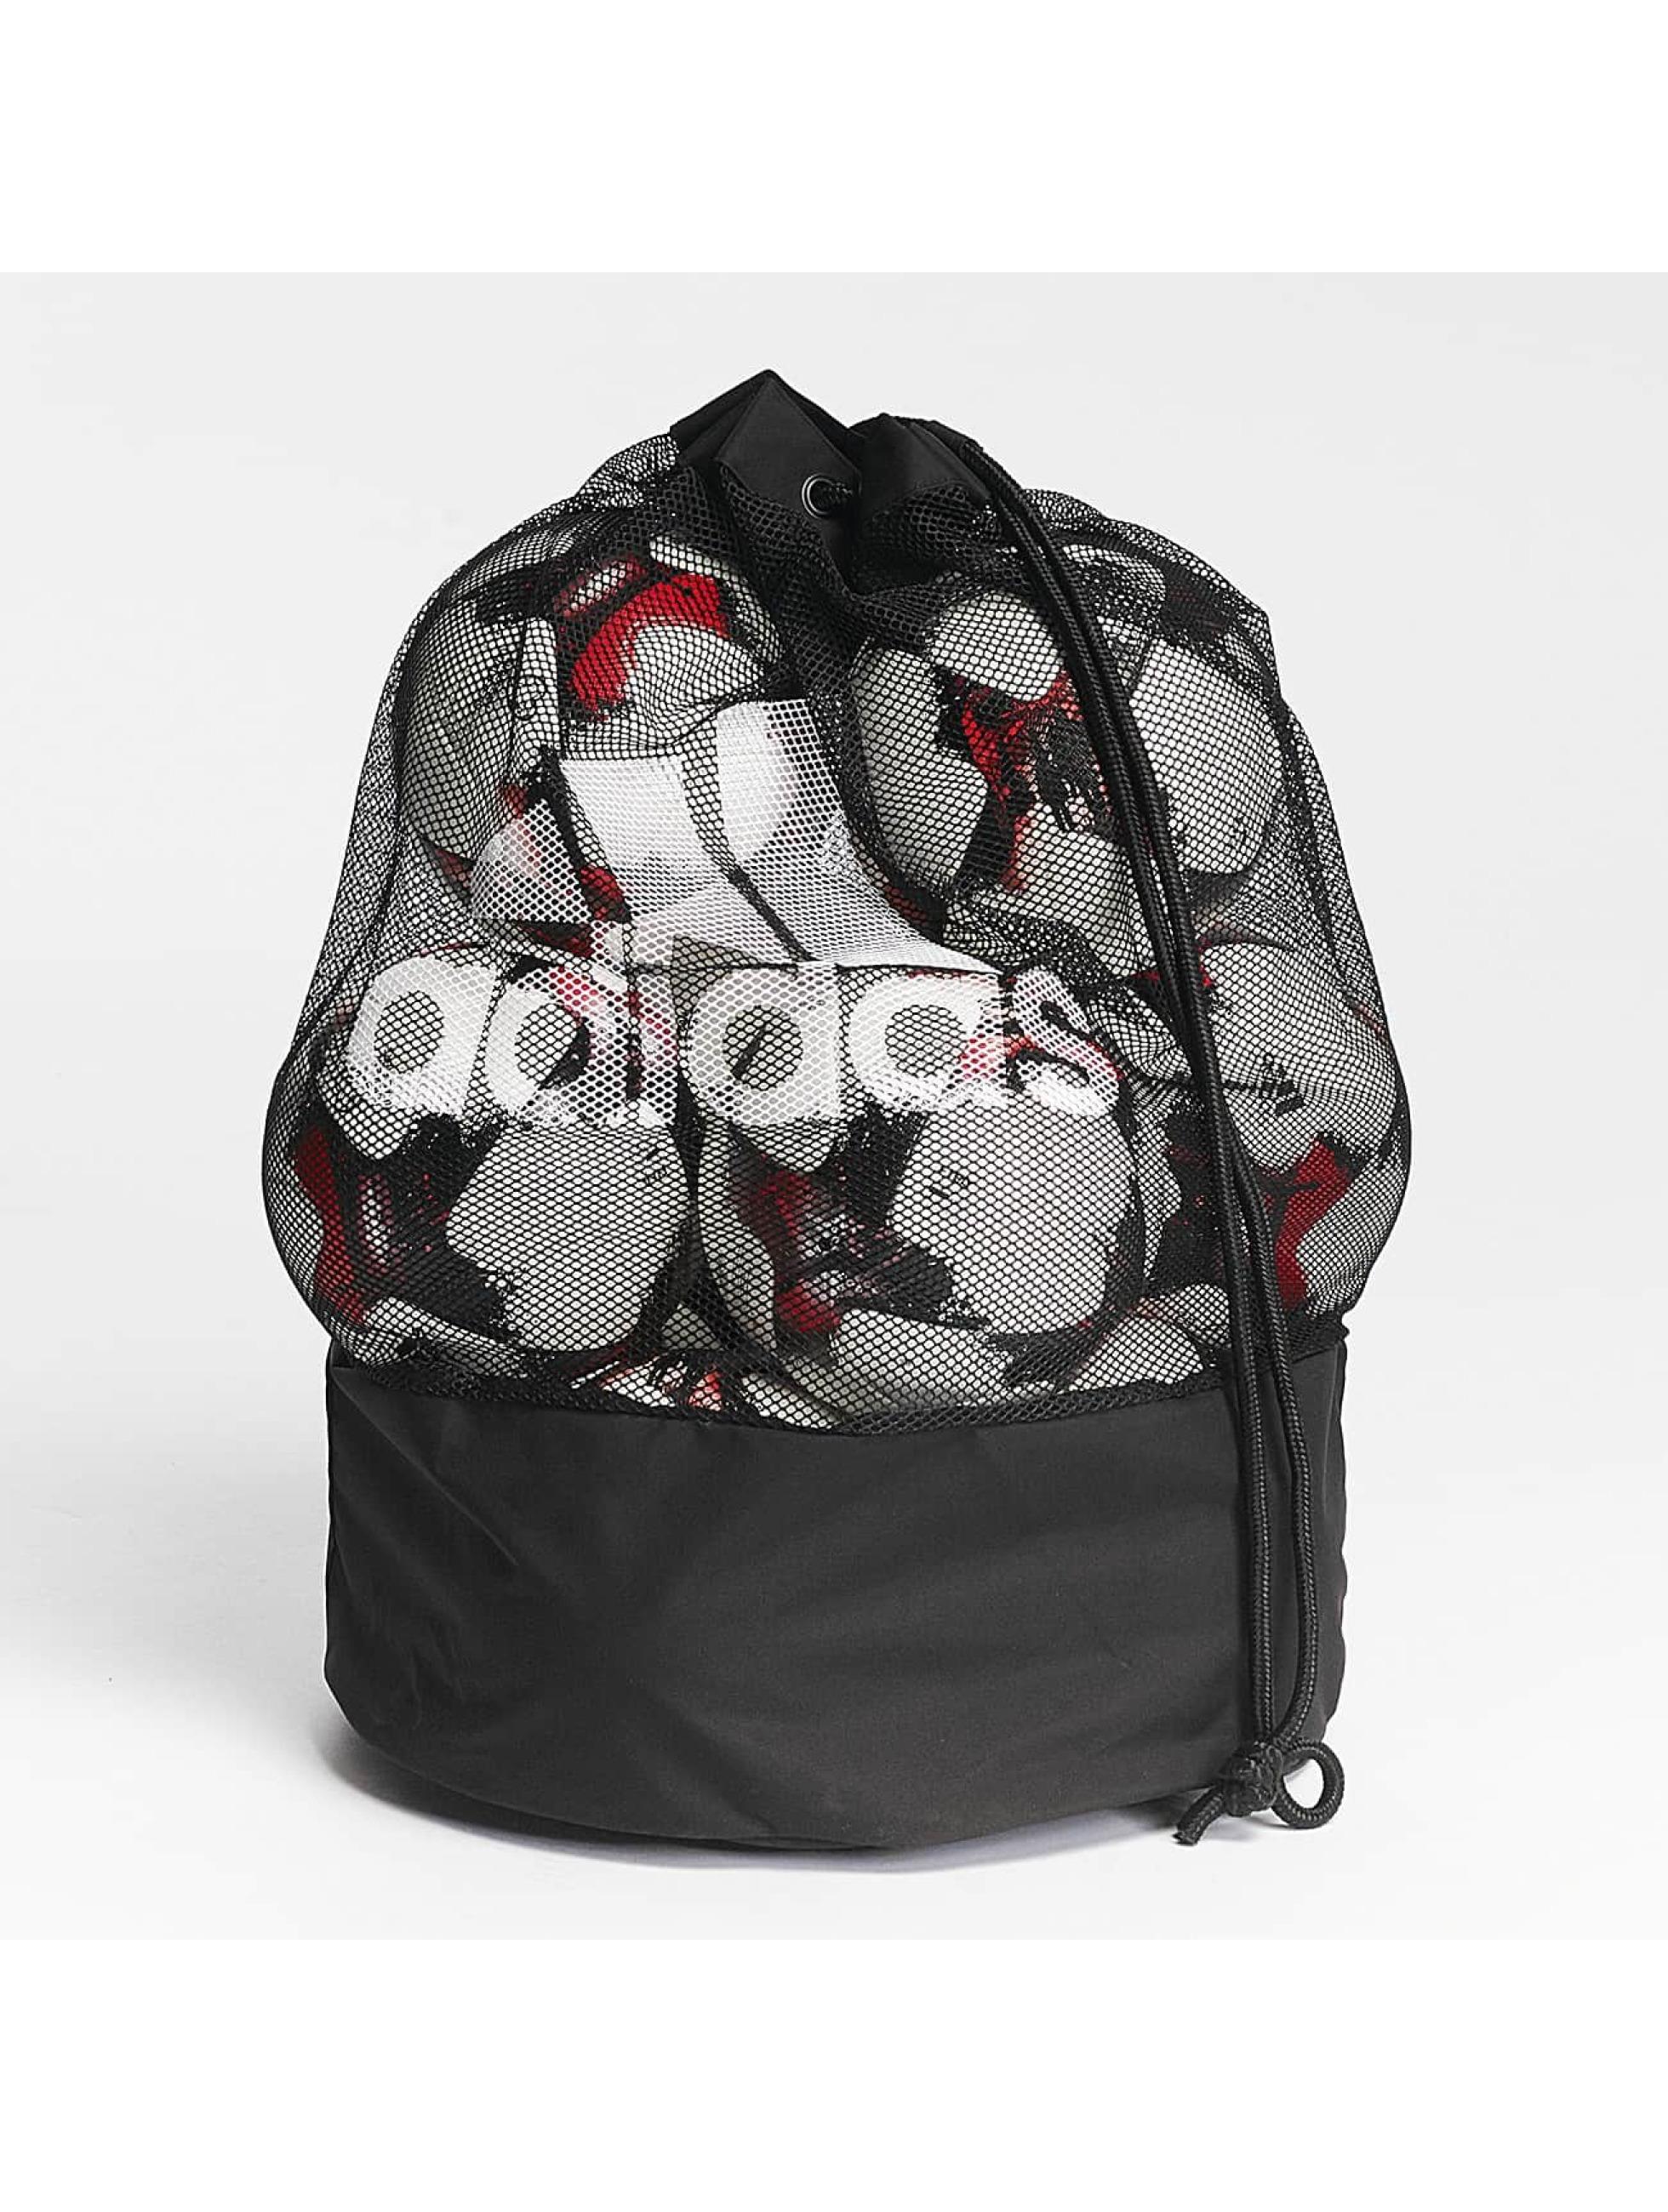 adidas More Soccer Ball Net black